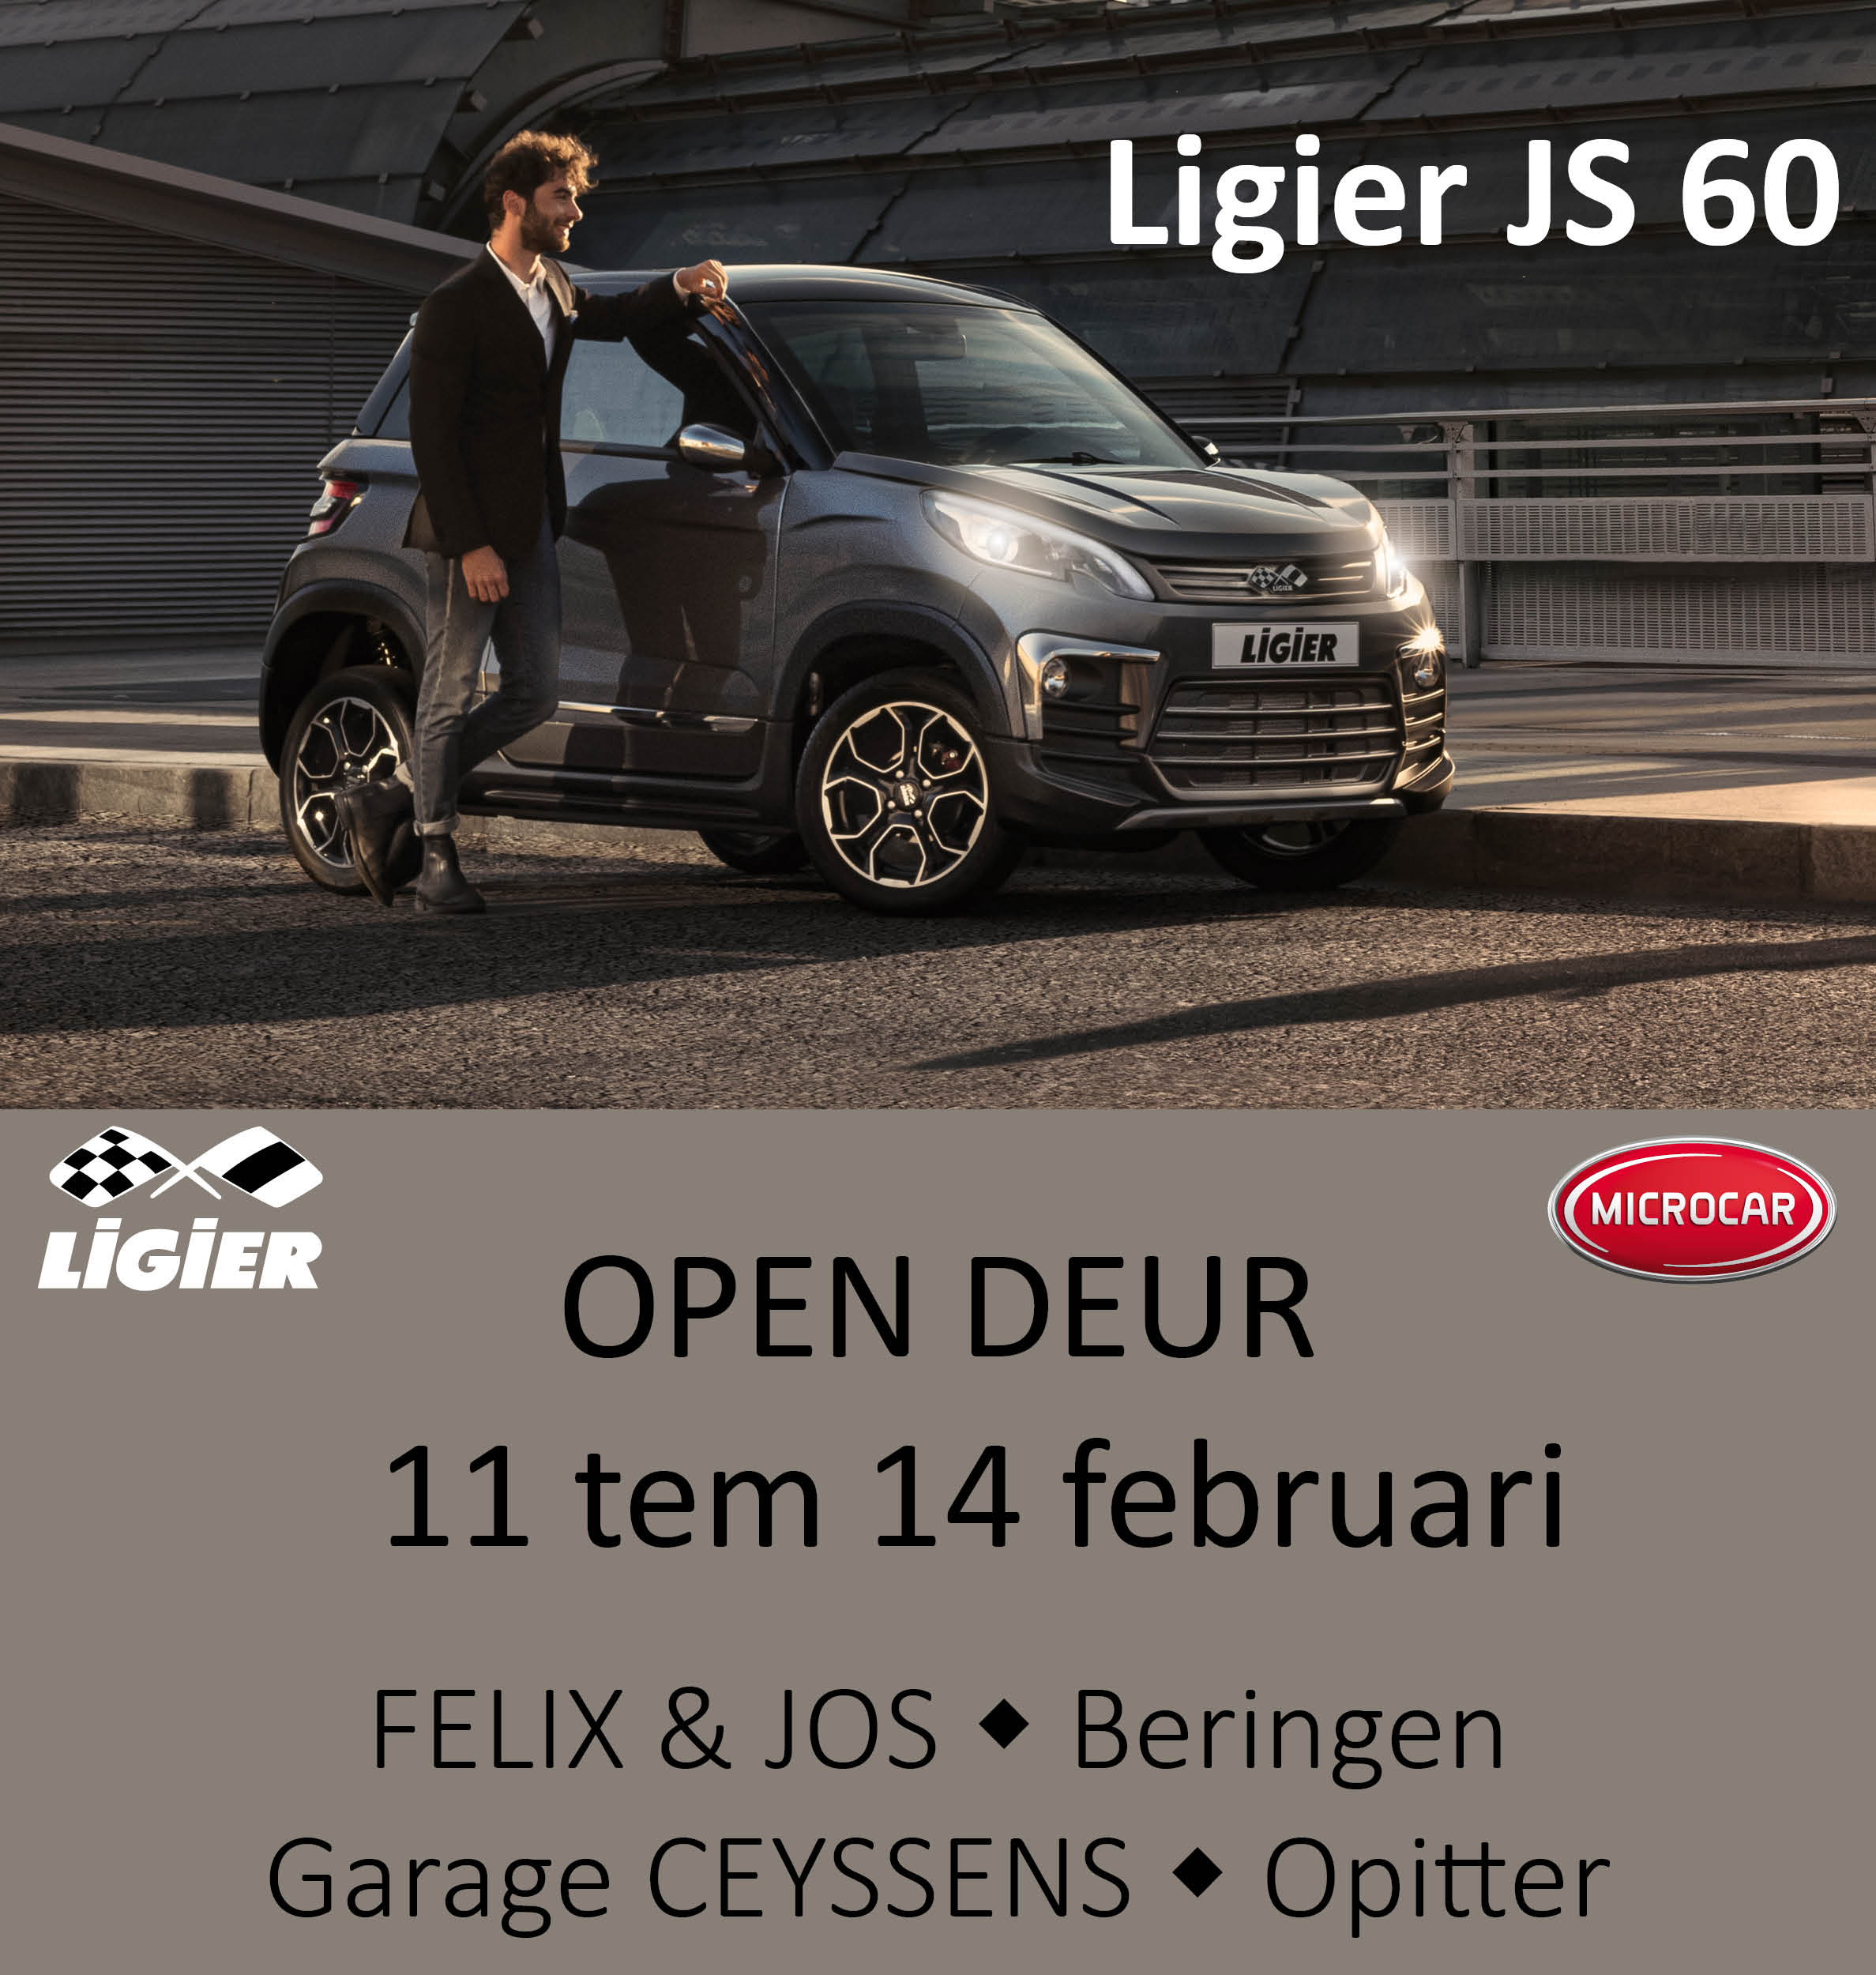 Adv Banners Ligier - opendeur februari 2021